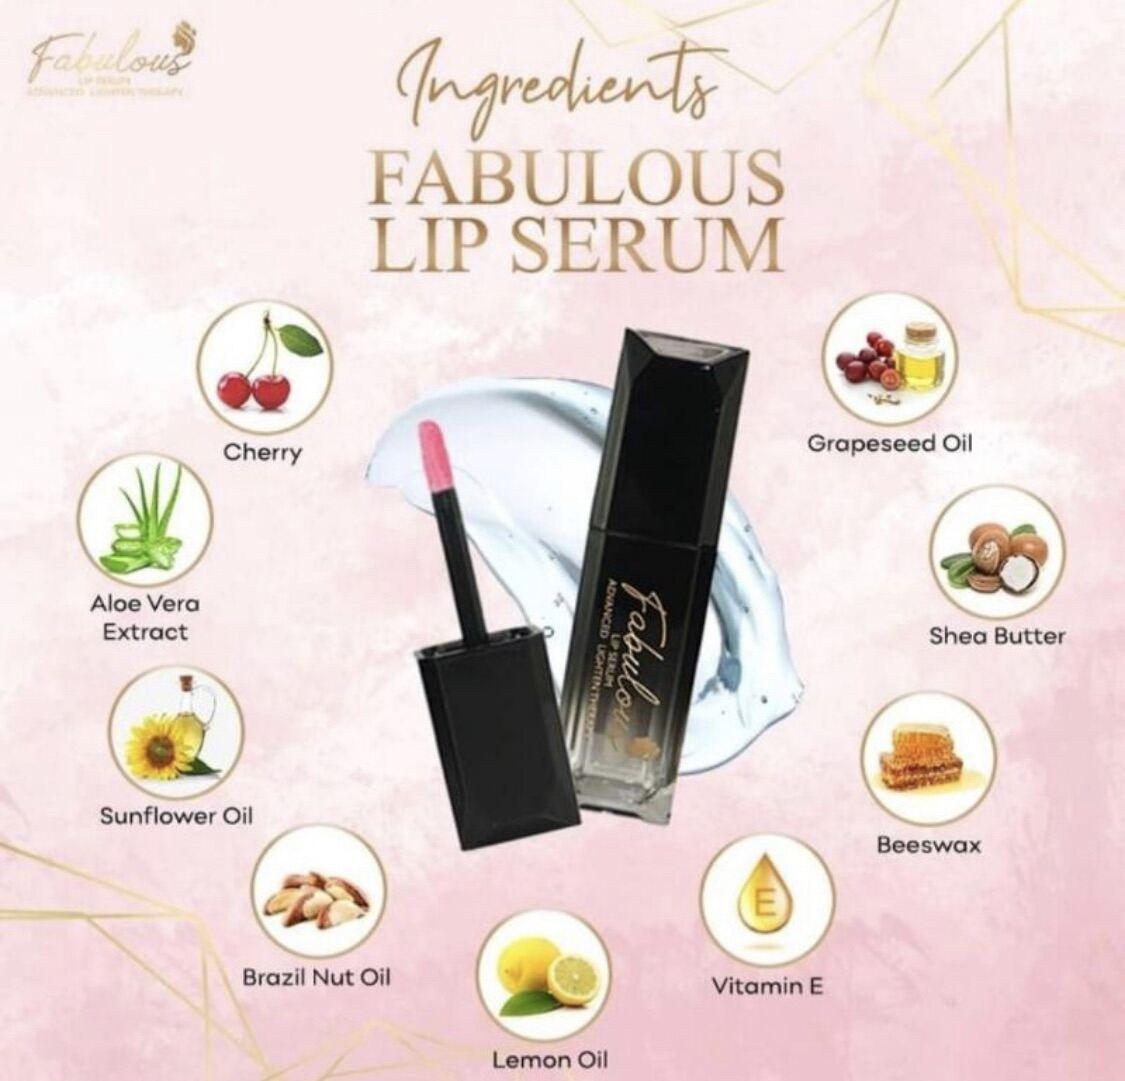 Fabulous Desire Lip Serum - your lip care in hand